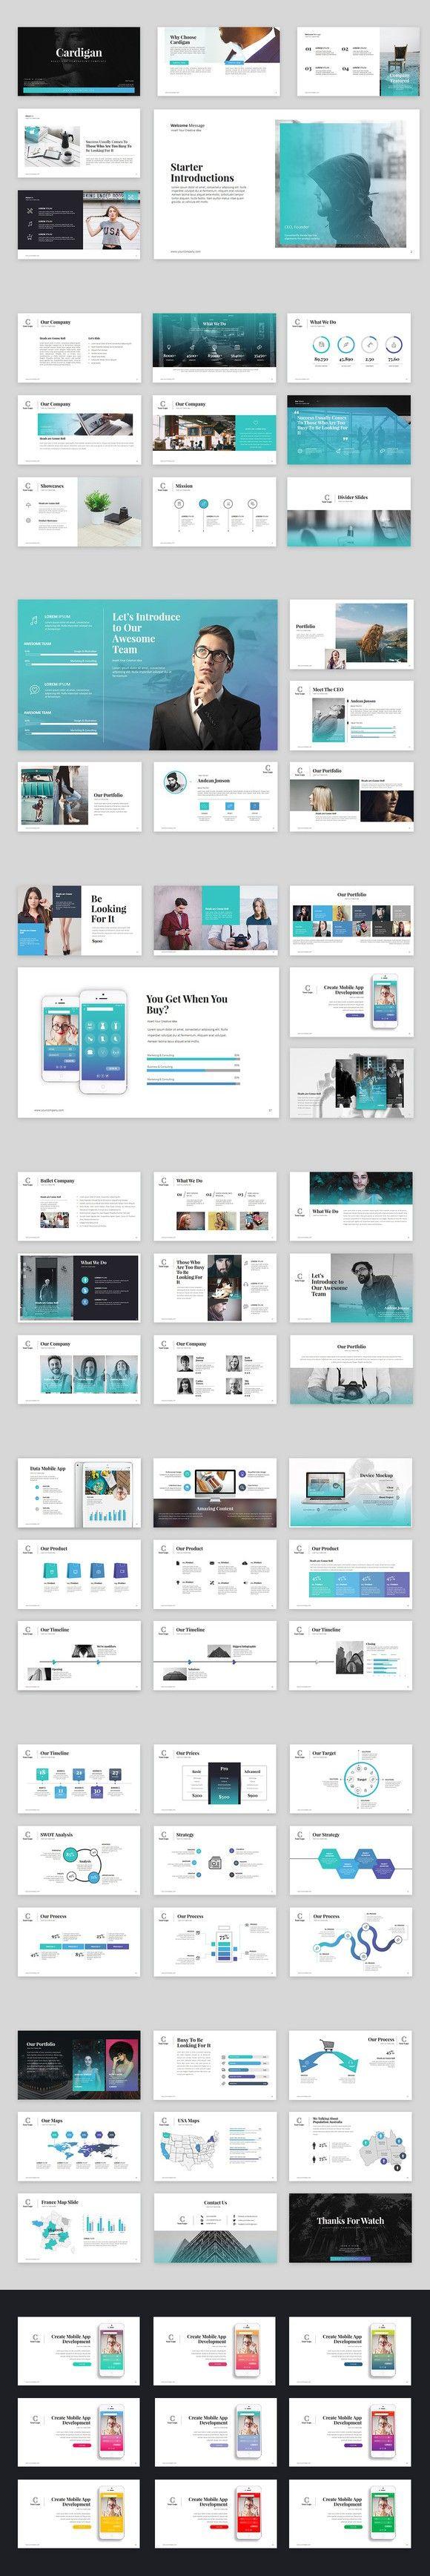 Cardigan Powerpoint Template. Presentation Templates. $12.00